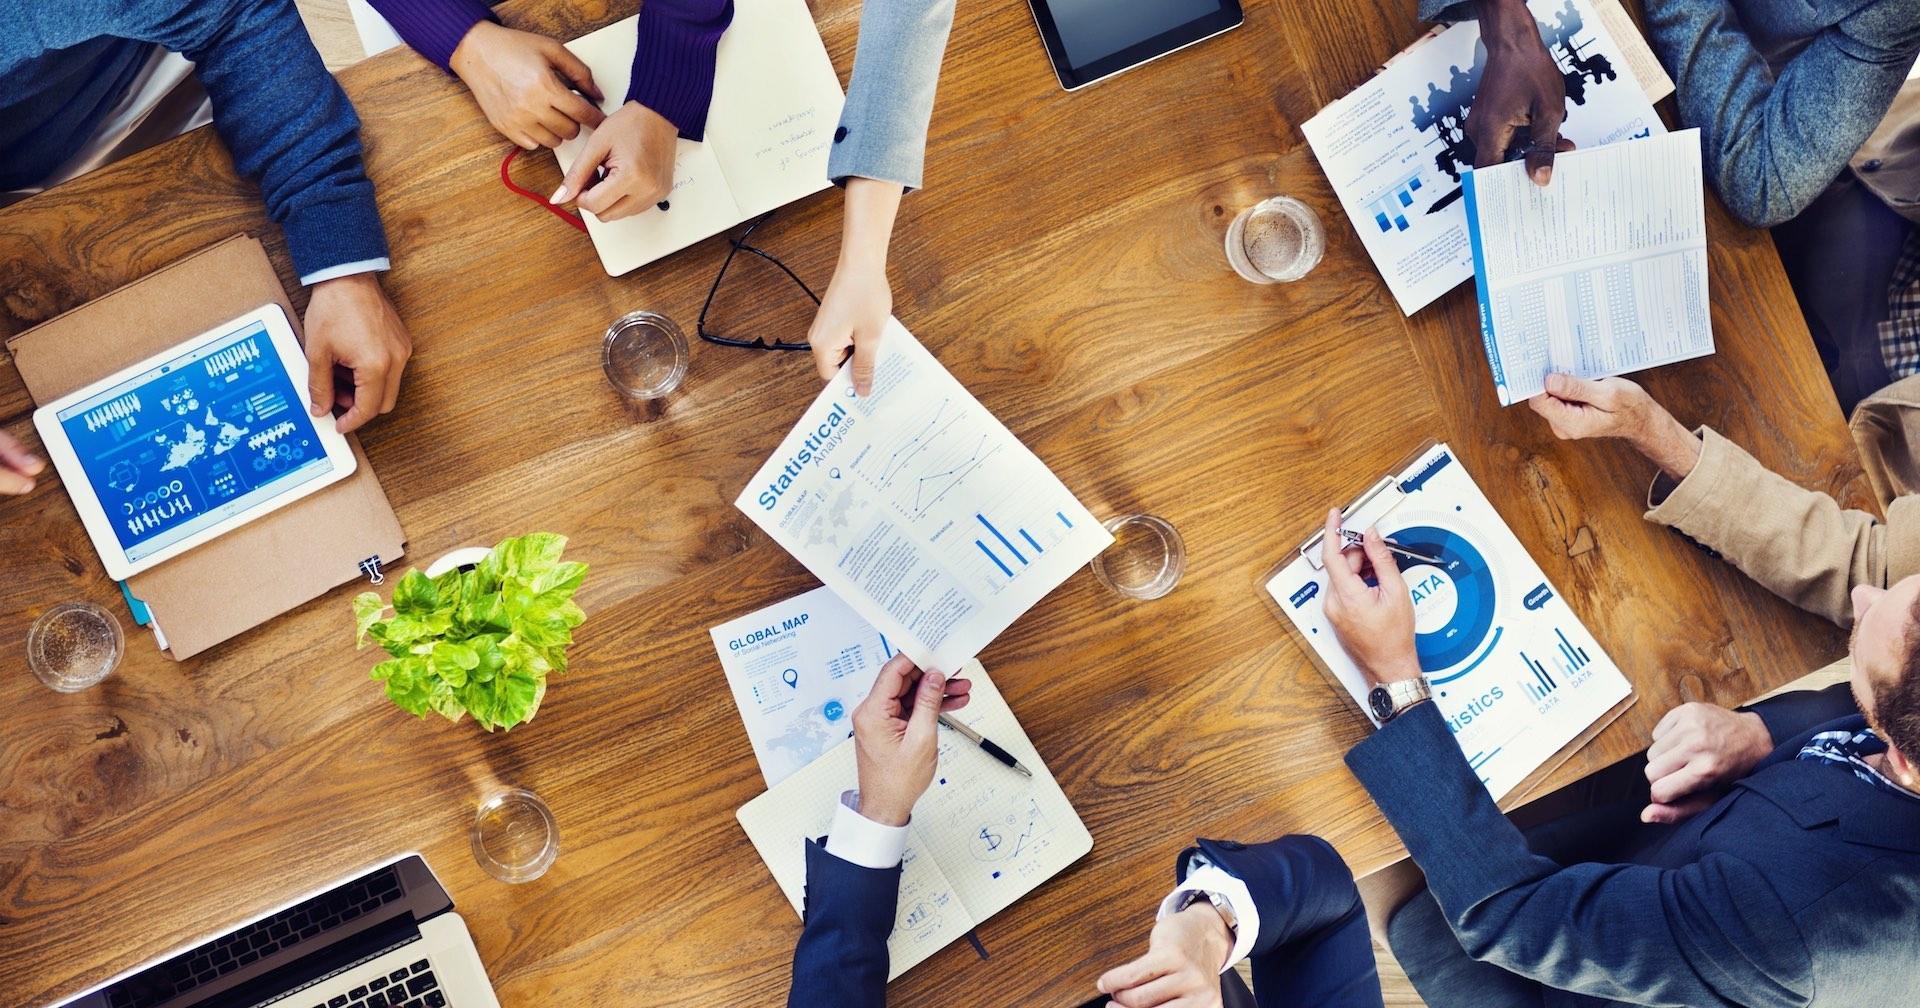 Engajar os clientes na consultoria